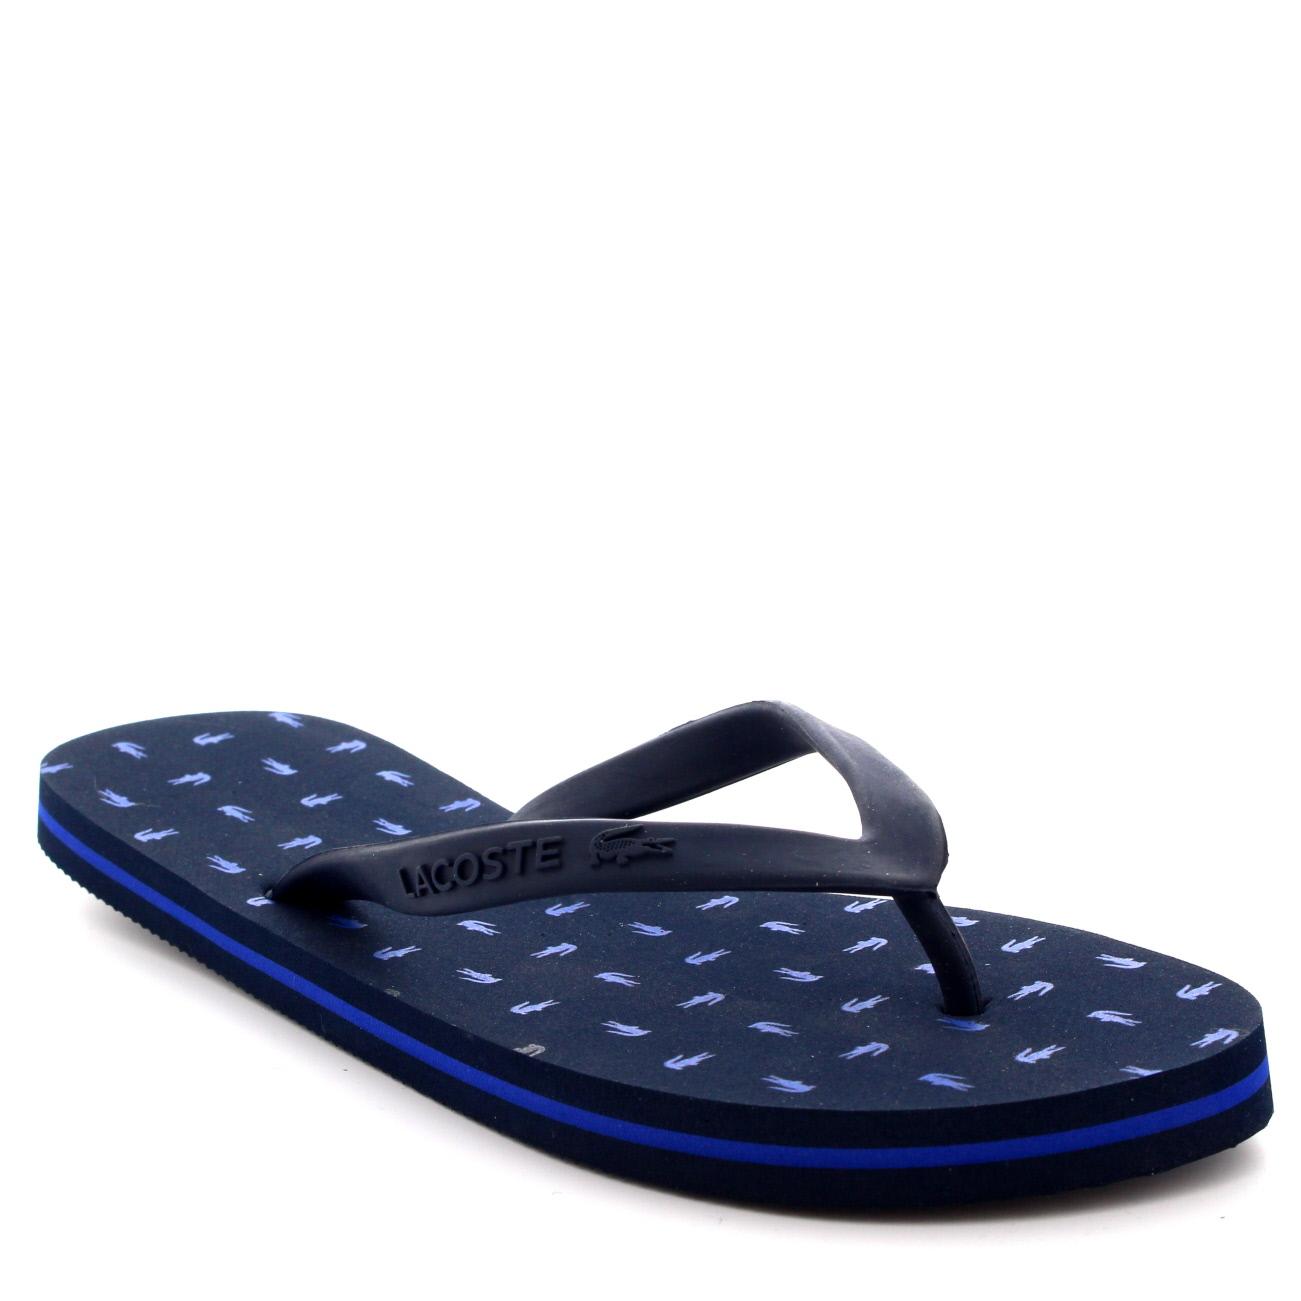 Womens lacoste sandals - Womens Lacoste Ancelle Slide 116 Slip On Lightweight